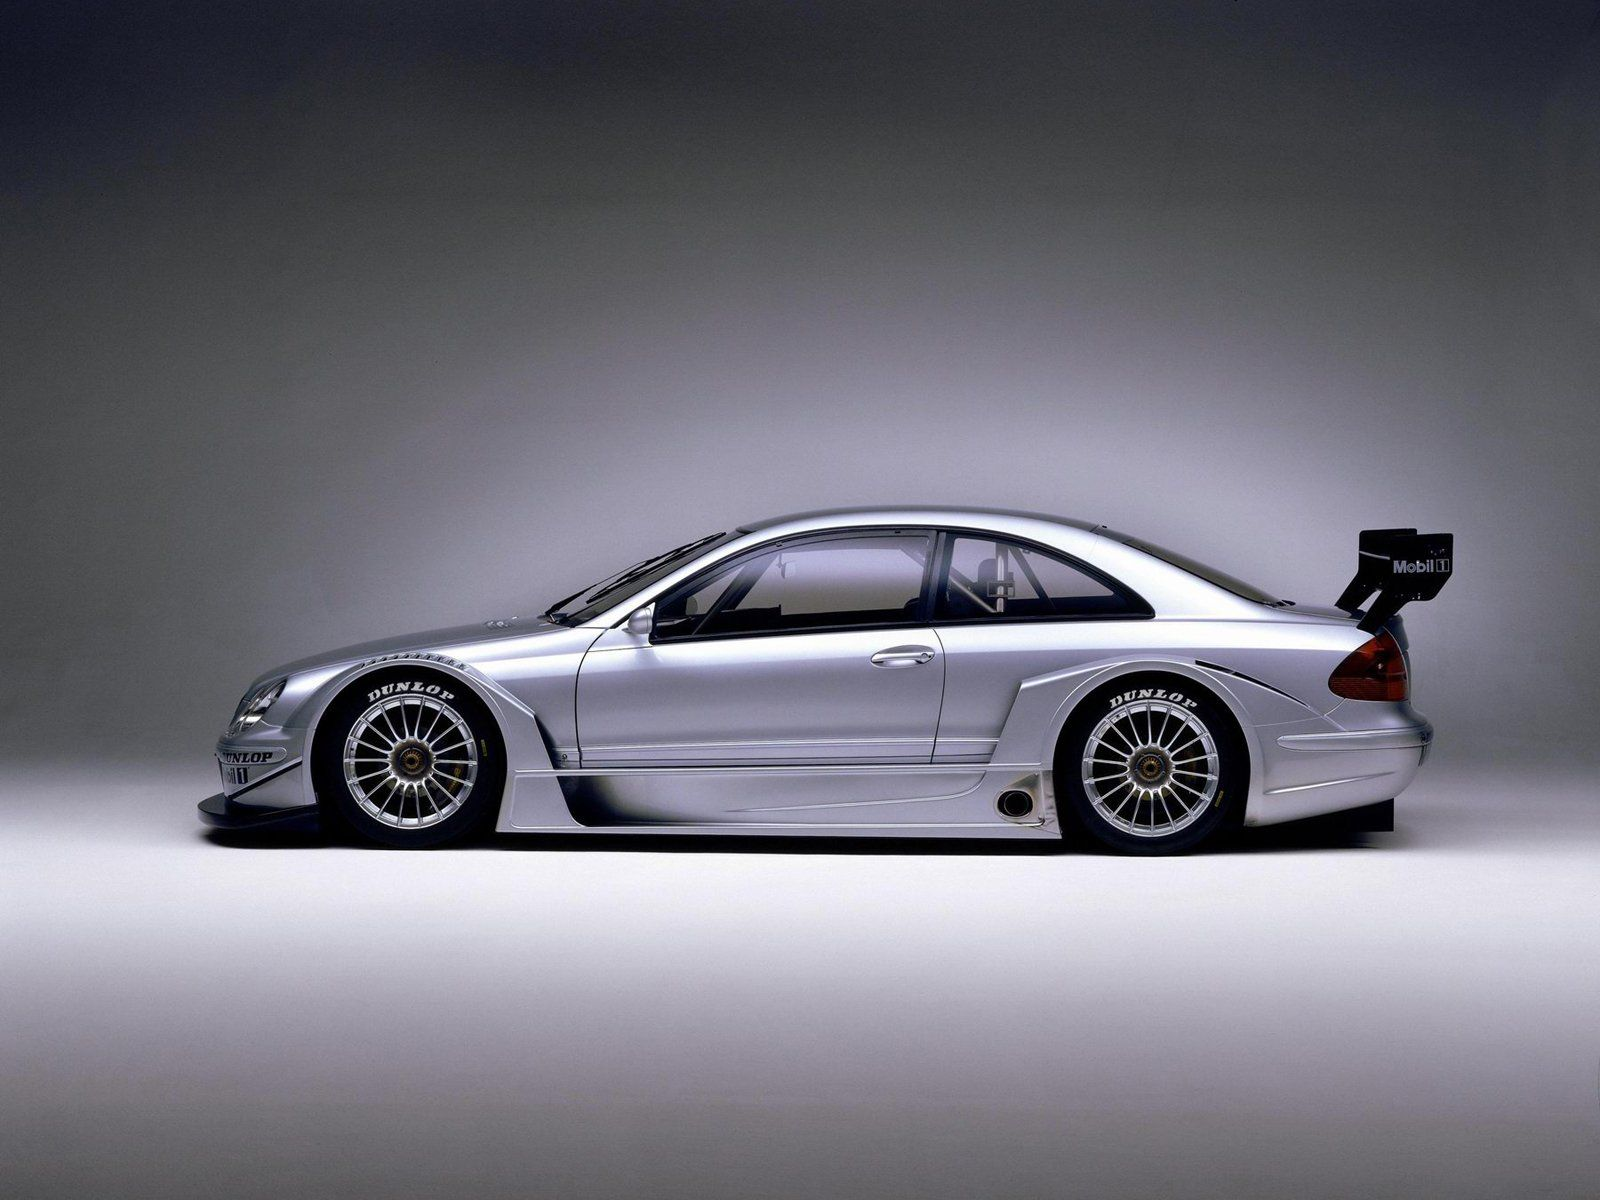 Mercedes benz clk dtm amg 2004 this special version for Mercedes benz clk dtm